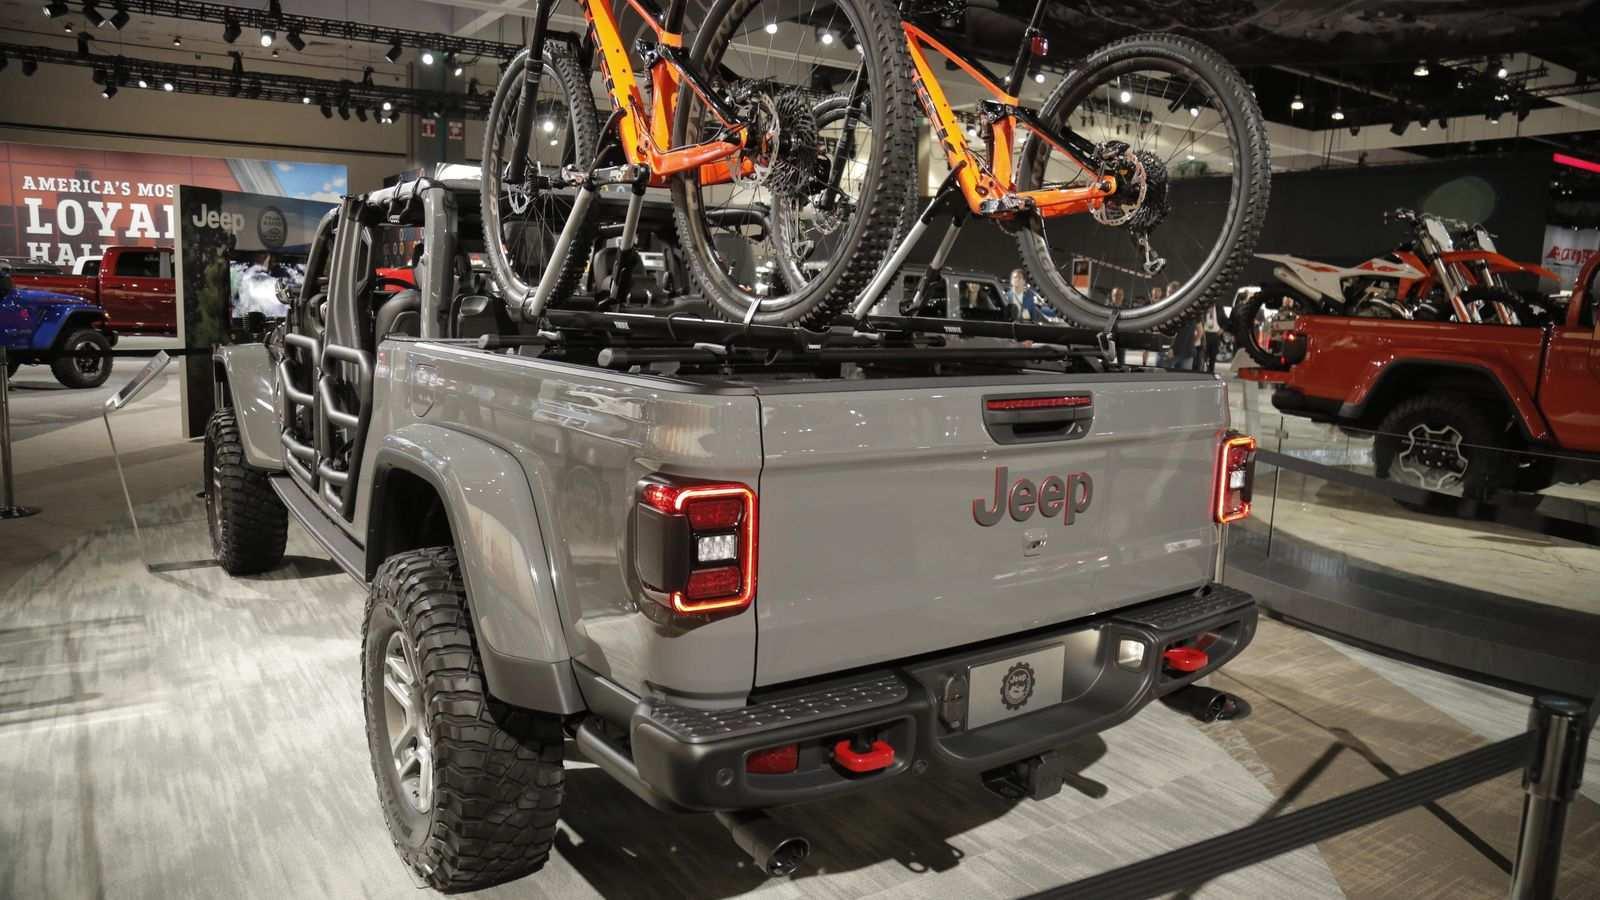 39 Concept of 2020 Jeep Gladiator Mopar Lift Kit Speed Test by 2020 Jeep Gladiator Mopar Lift Kit